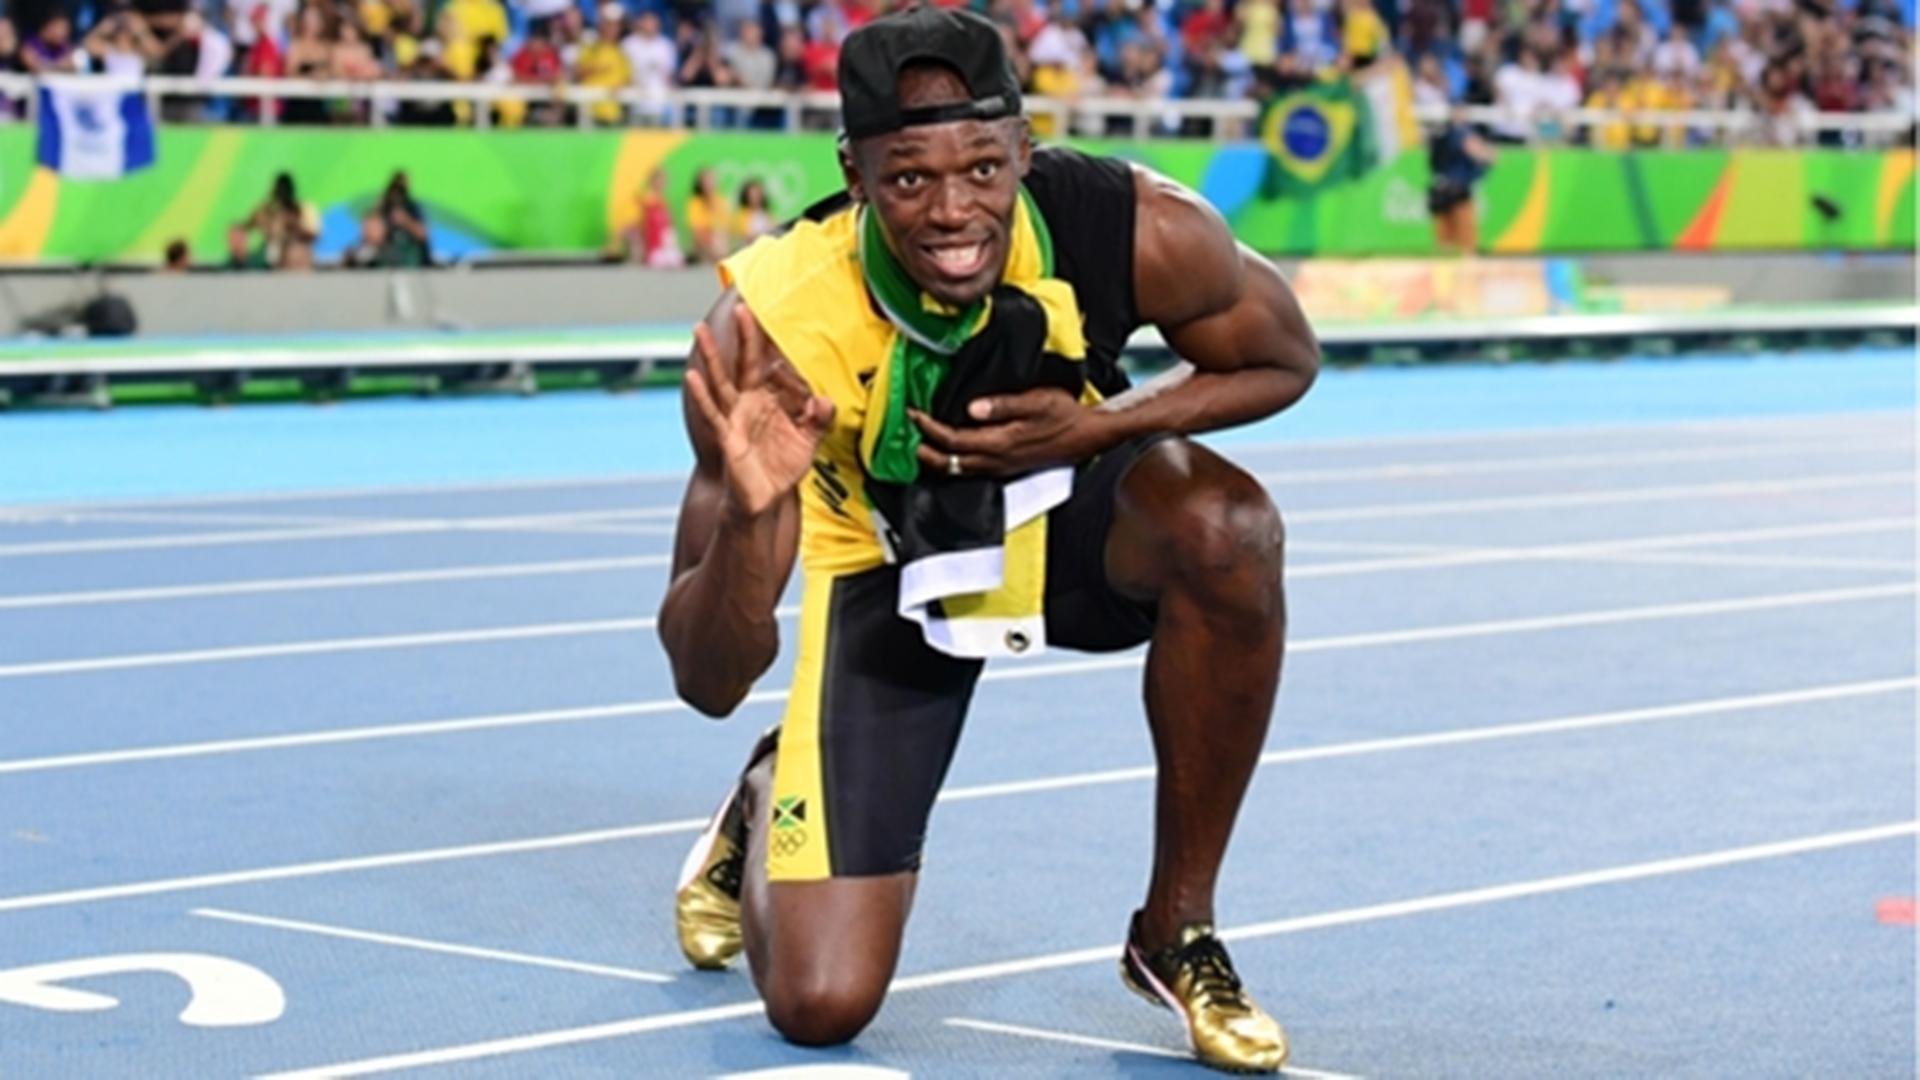 Legendary sprinter Usain Bolt retires